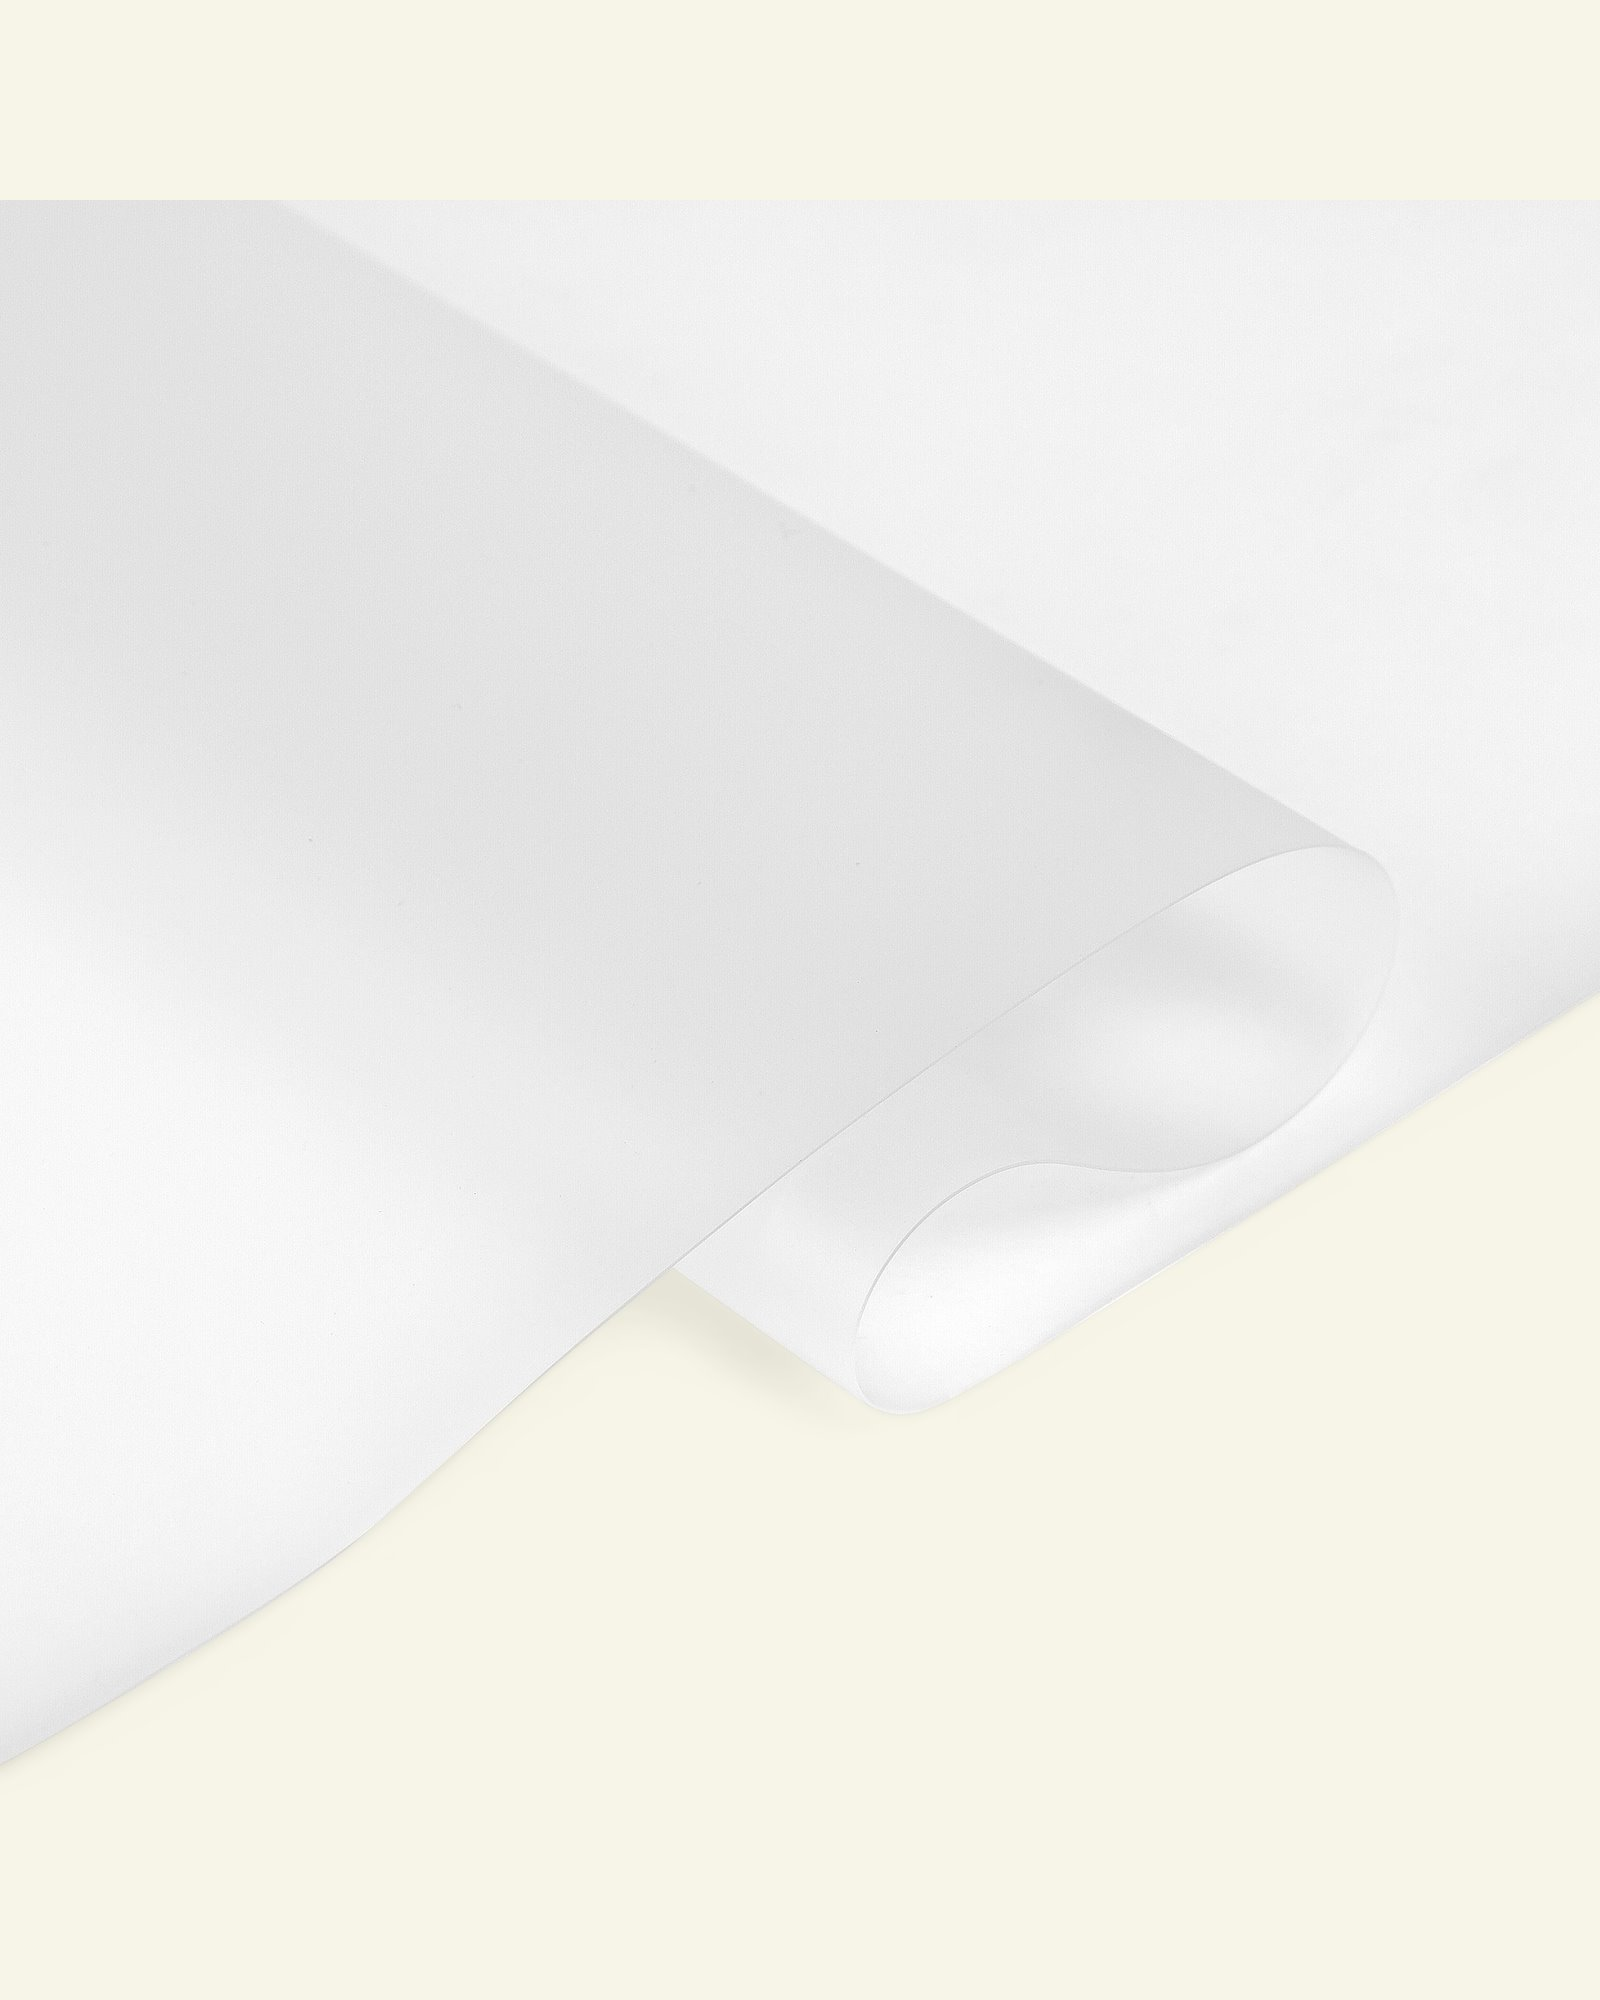 Silikon-Bogen, 30x40cm Weiß, St.